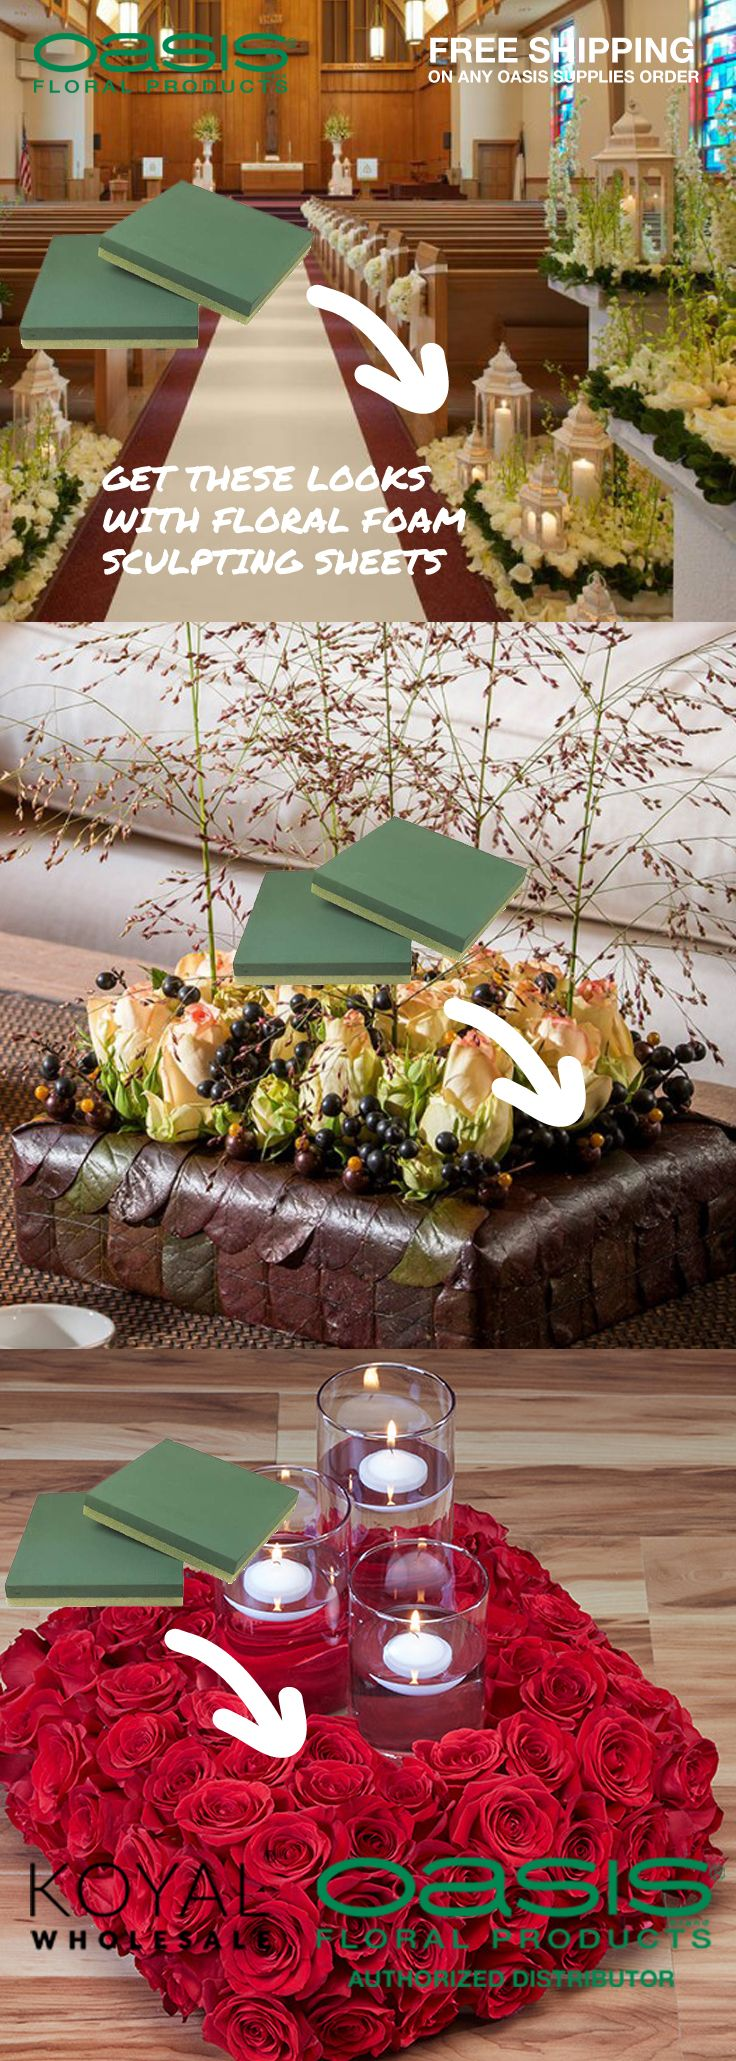 Oasis sculpting sheet floral foam squares florals